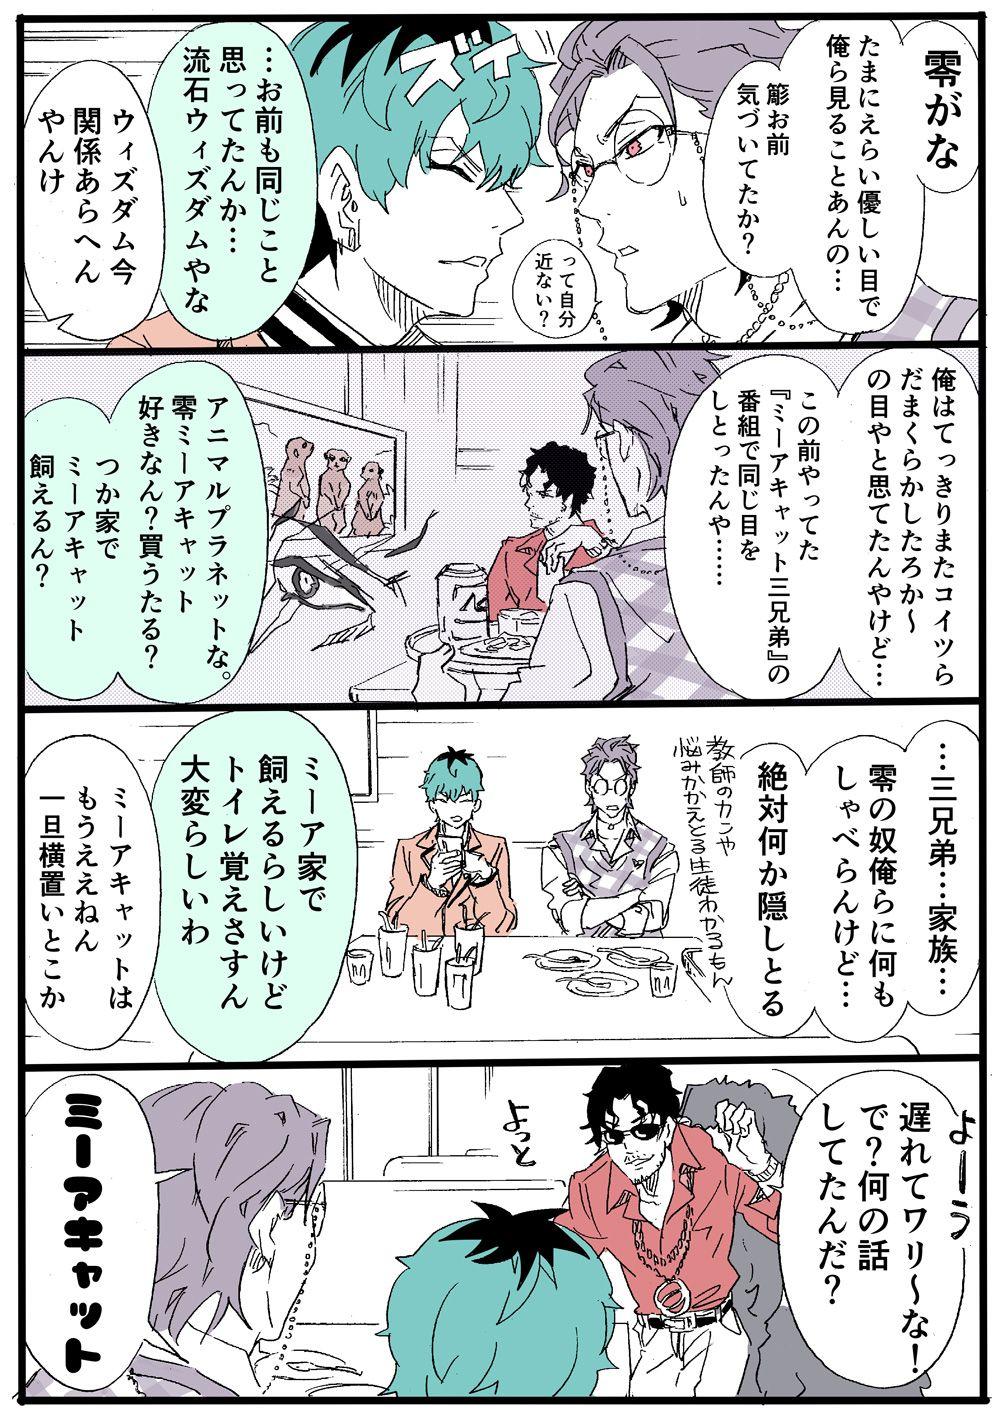 Twitter Rap Battle Comics Rei